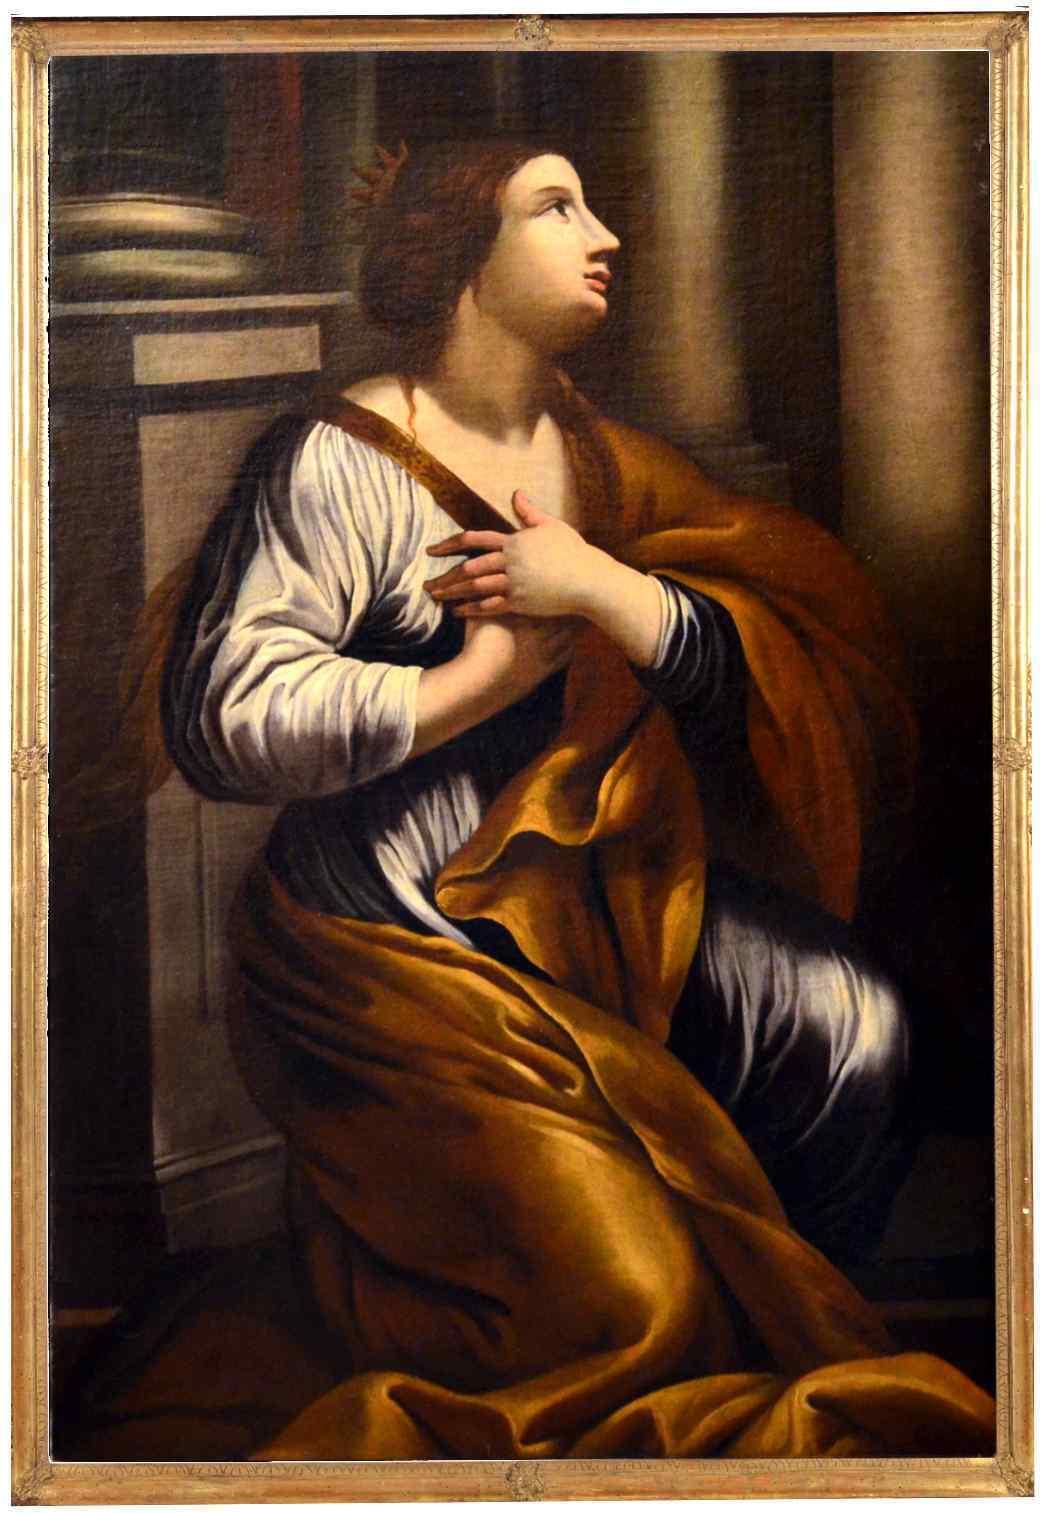 Gian Giacomo Sementi (1583 - 1640), attrib., Santa Caterina